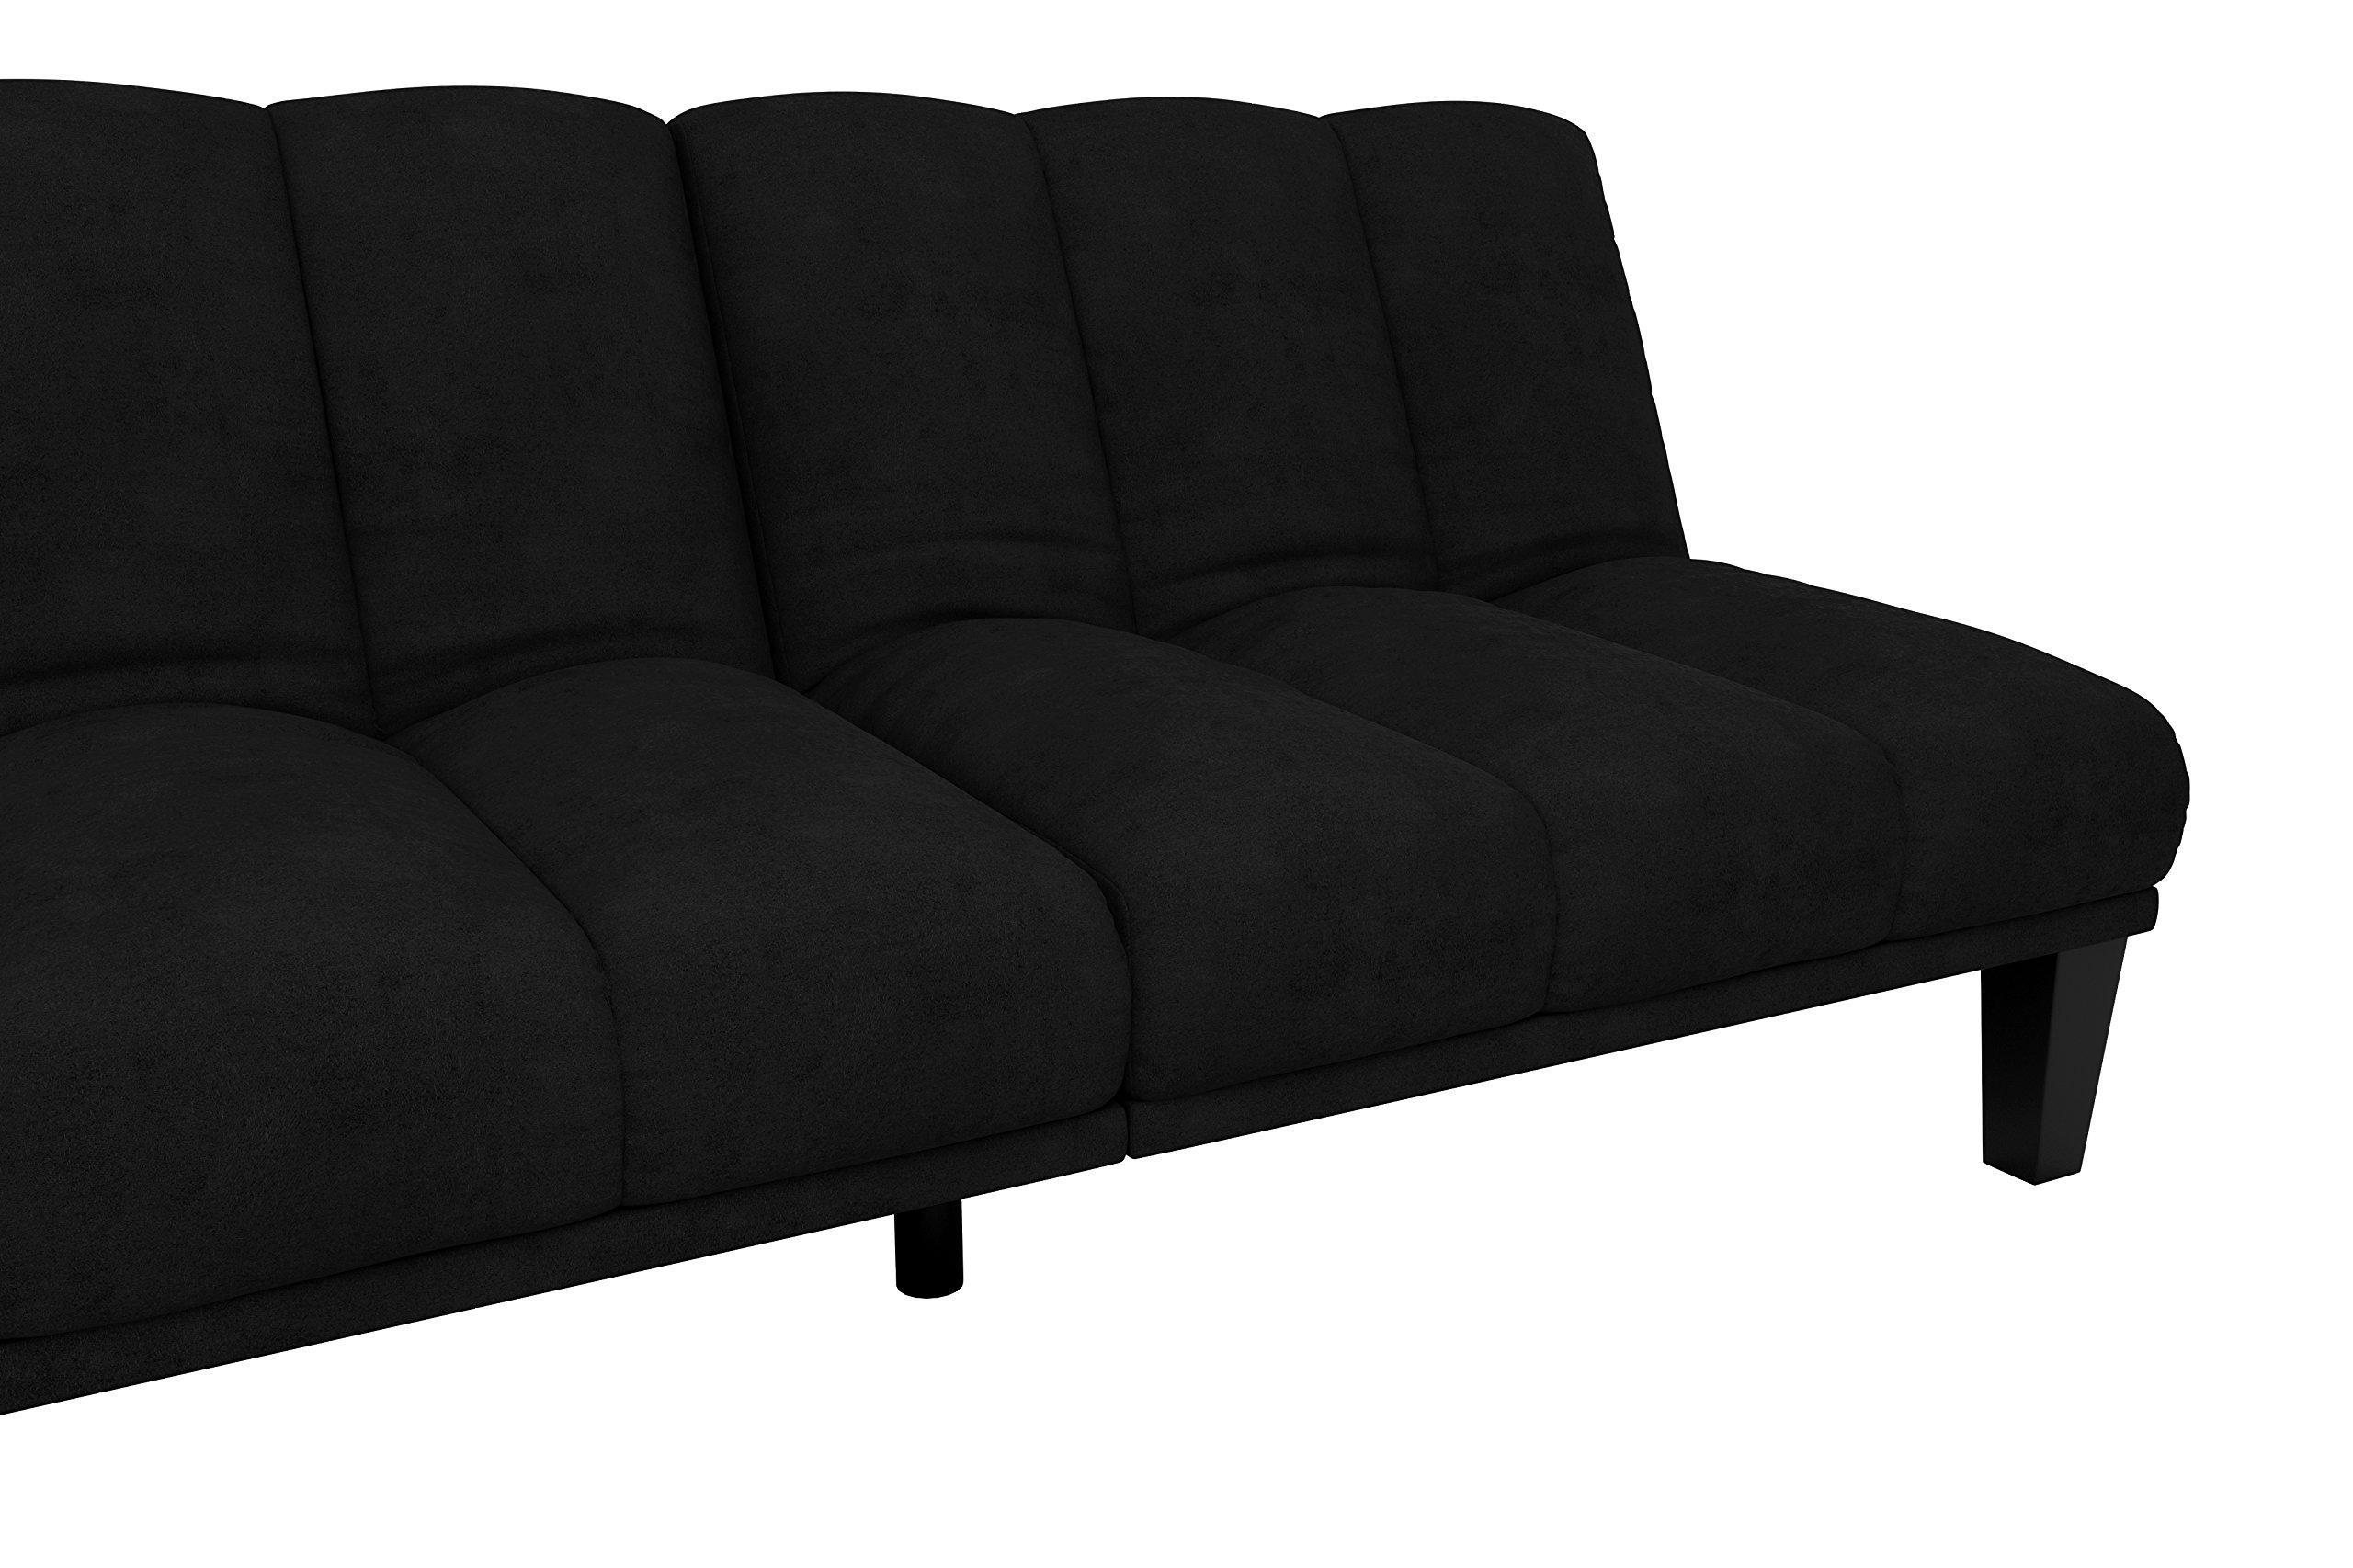 Hamilton Estate Premium Sofa Futon Sleeper Comfortable Plush Upholstery, Rich Black by DHP (Image #8)